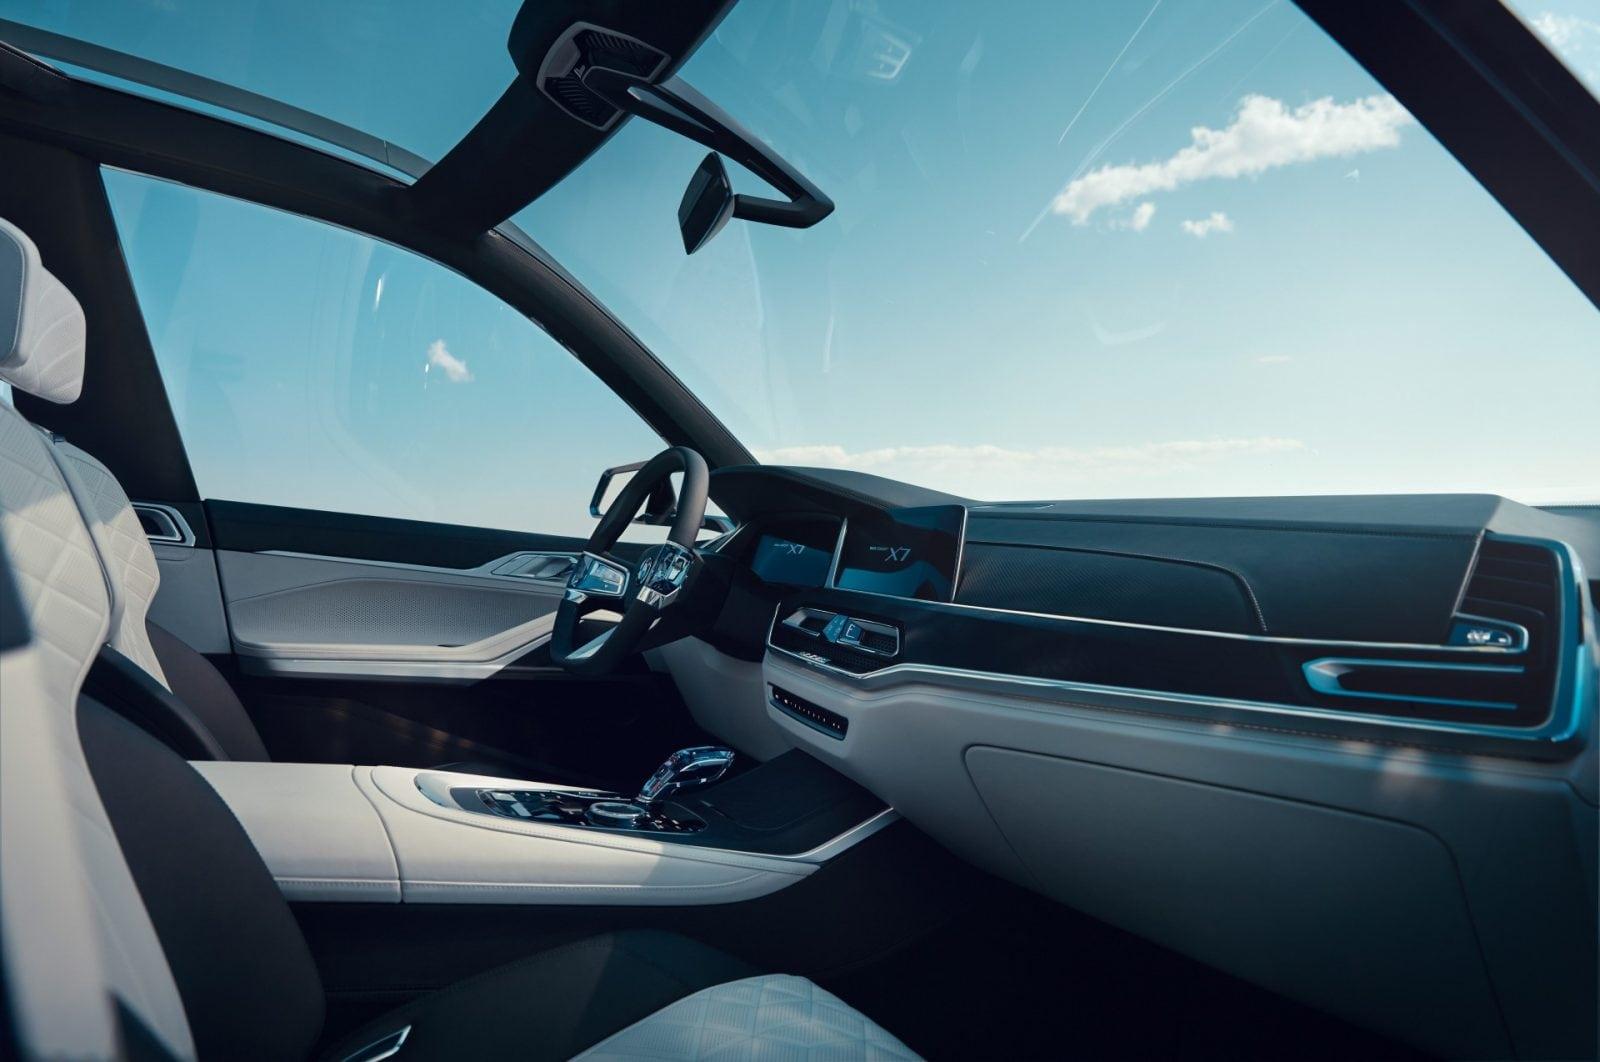 BMW Concept X7 iPerformance 2017 Interior